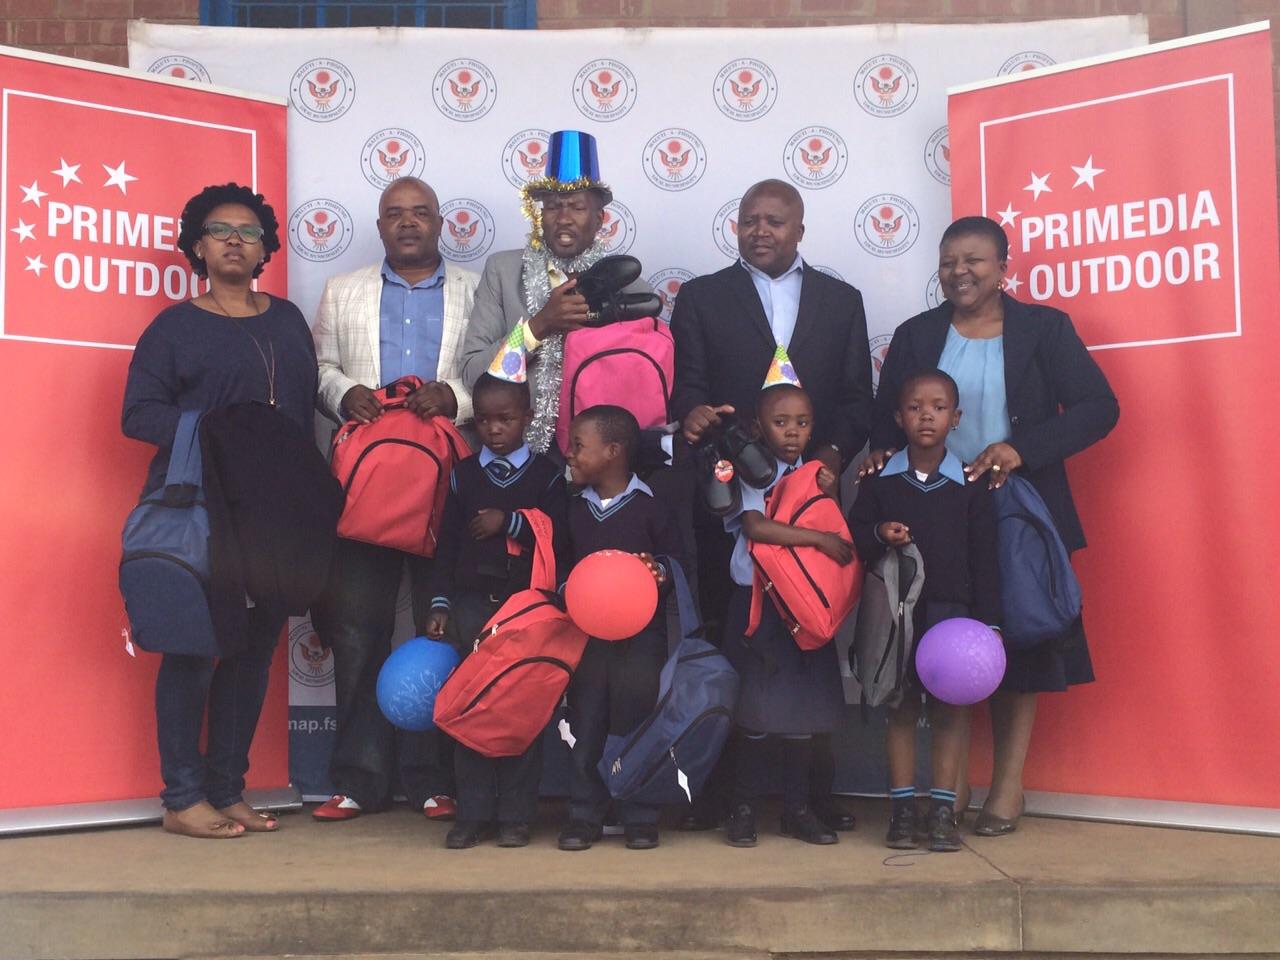 THE Maluti-a-Phofung Local Municipality's executive mayor, Vusi Tshabalala (middle), with representatives of Primedia Outdoor, the principal of the Sentebale Primary School and some of the beneficiaries. From the left are, front: Kanva Moloi, Karabo Xaba, Pontsho Dlamini, Ntsebeng Koma, Thato Hamaduna, Lebohang Mokubung and Montsheng Kgatla; back: Silindile Mafukleka (marketing services strategist, Primedia Outdoor), Simphiwe Sgongwe (account manager: development, Primedia Outdoor), Tshabalala,